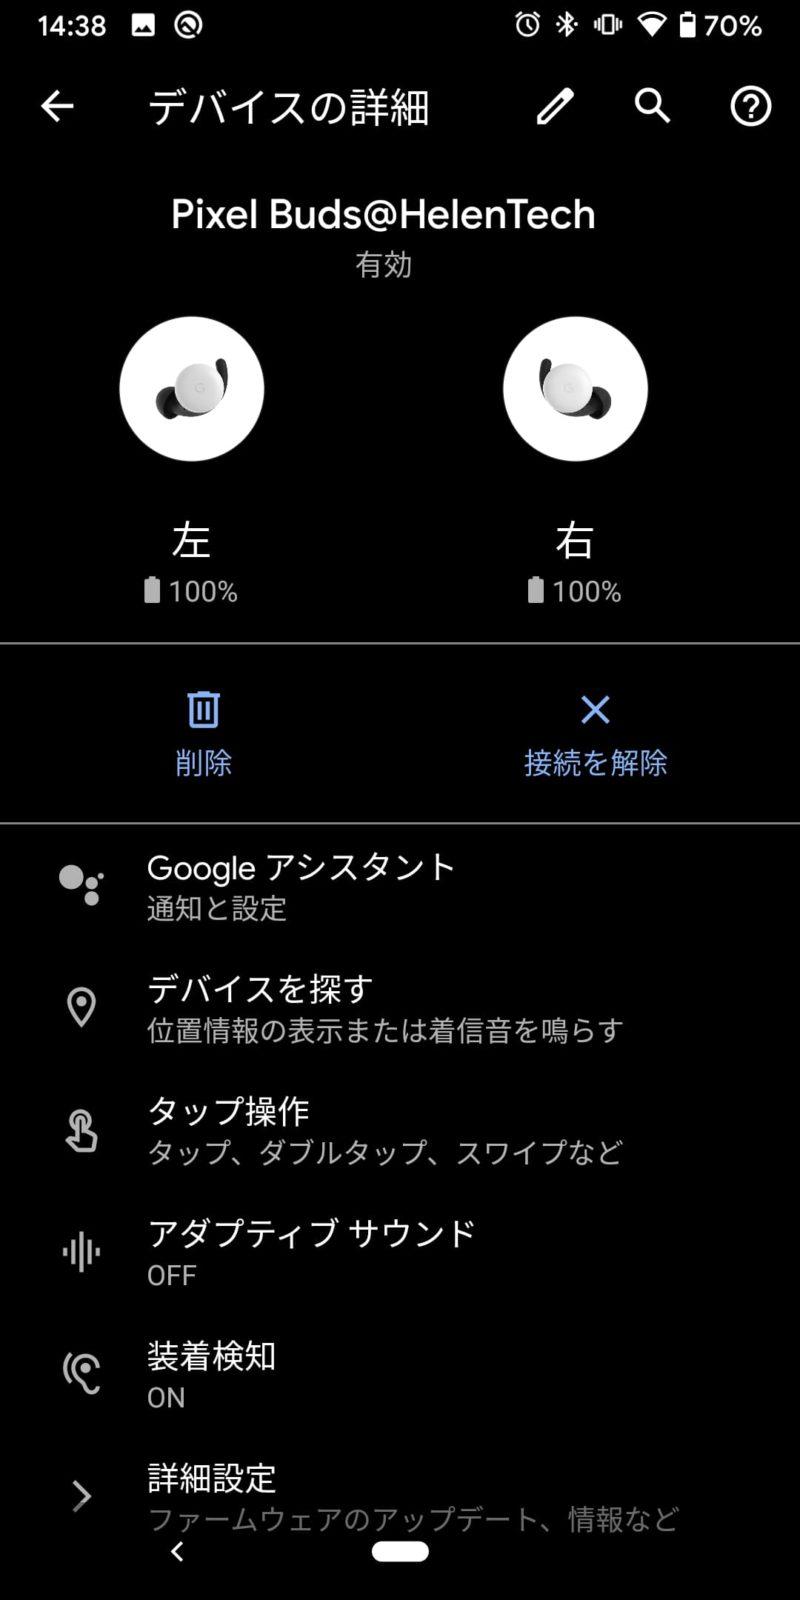 Screenshot 20200514 143837 800x1600-「Google Pixel Buds (2020)」を実機レビュー。完全ワイヤレスになって満足だけど、機能面は物足りないかも